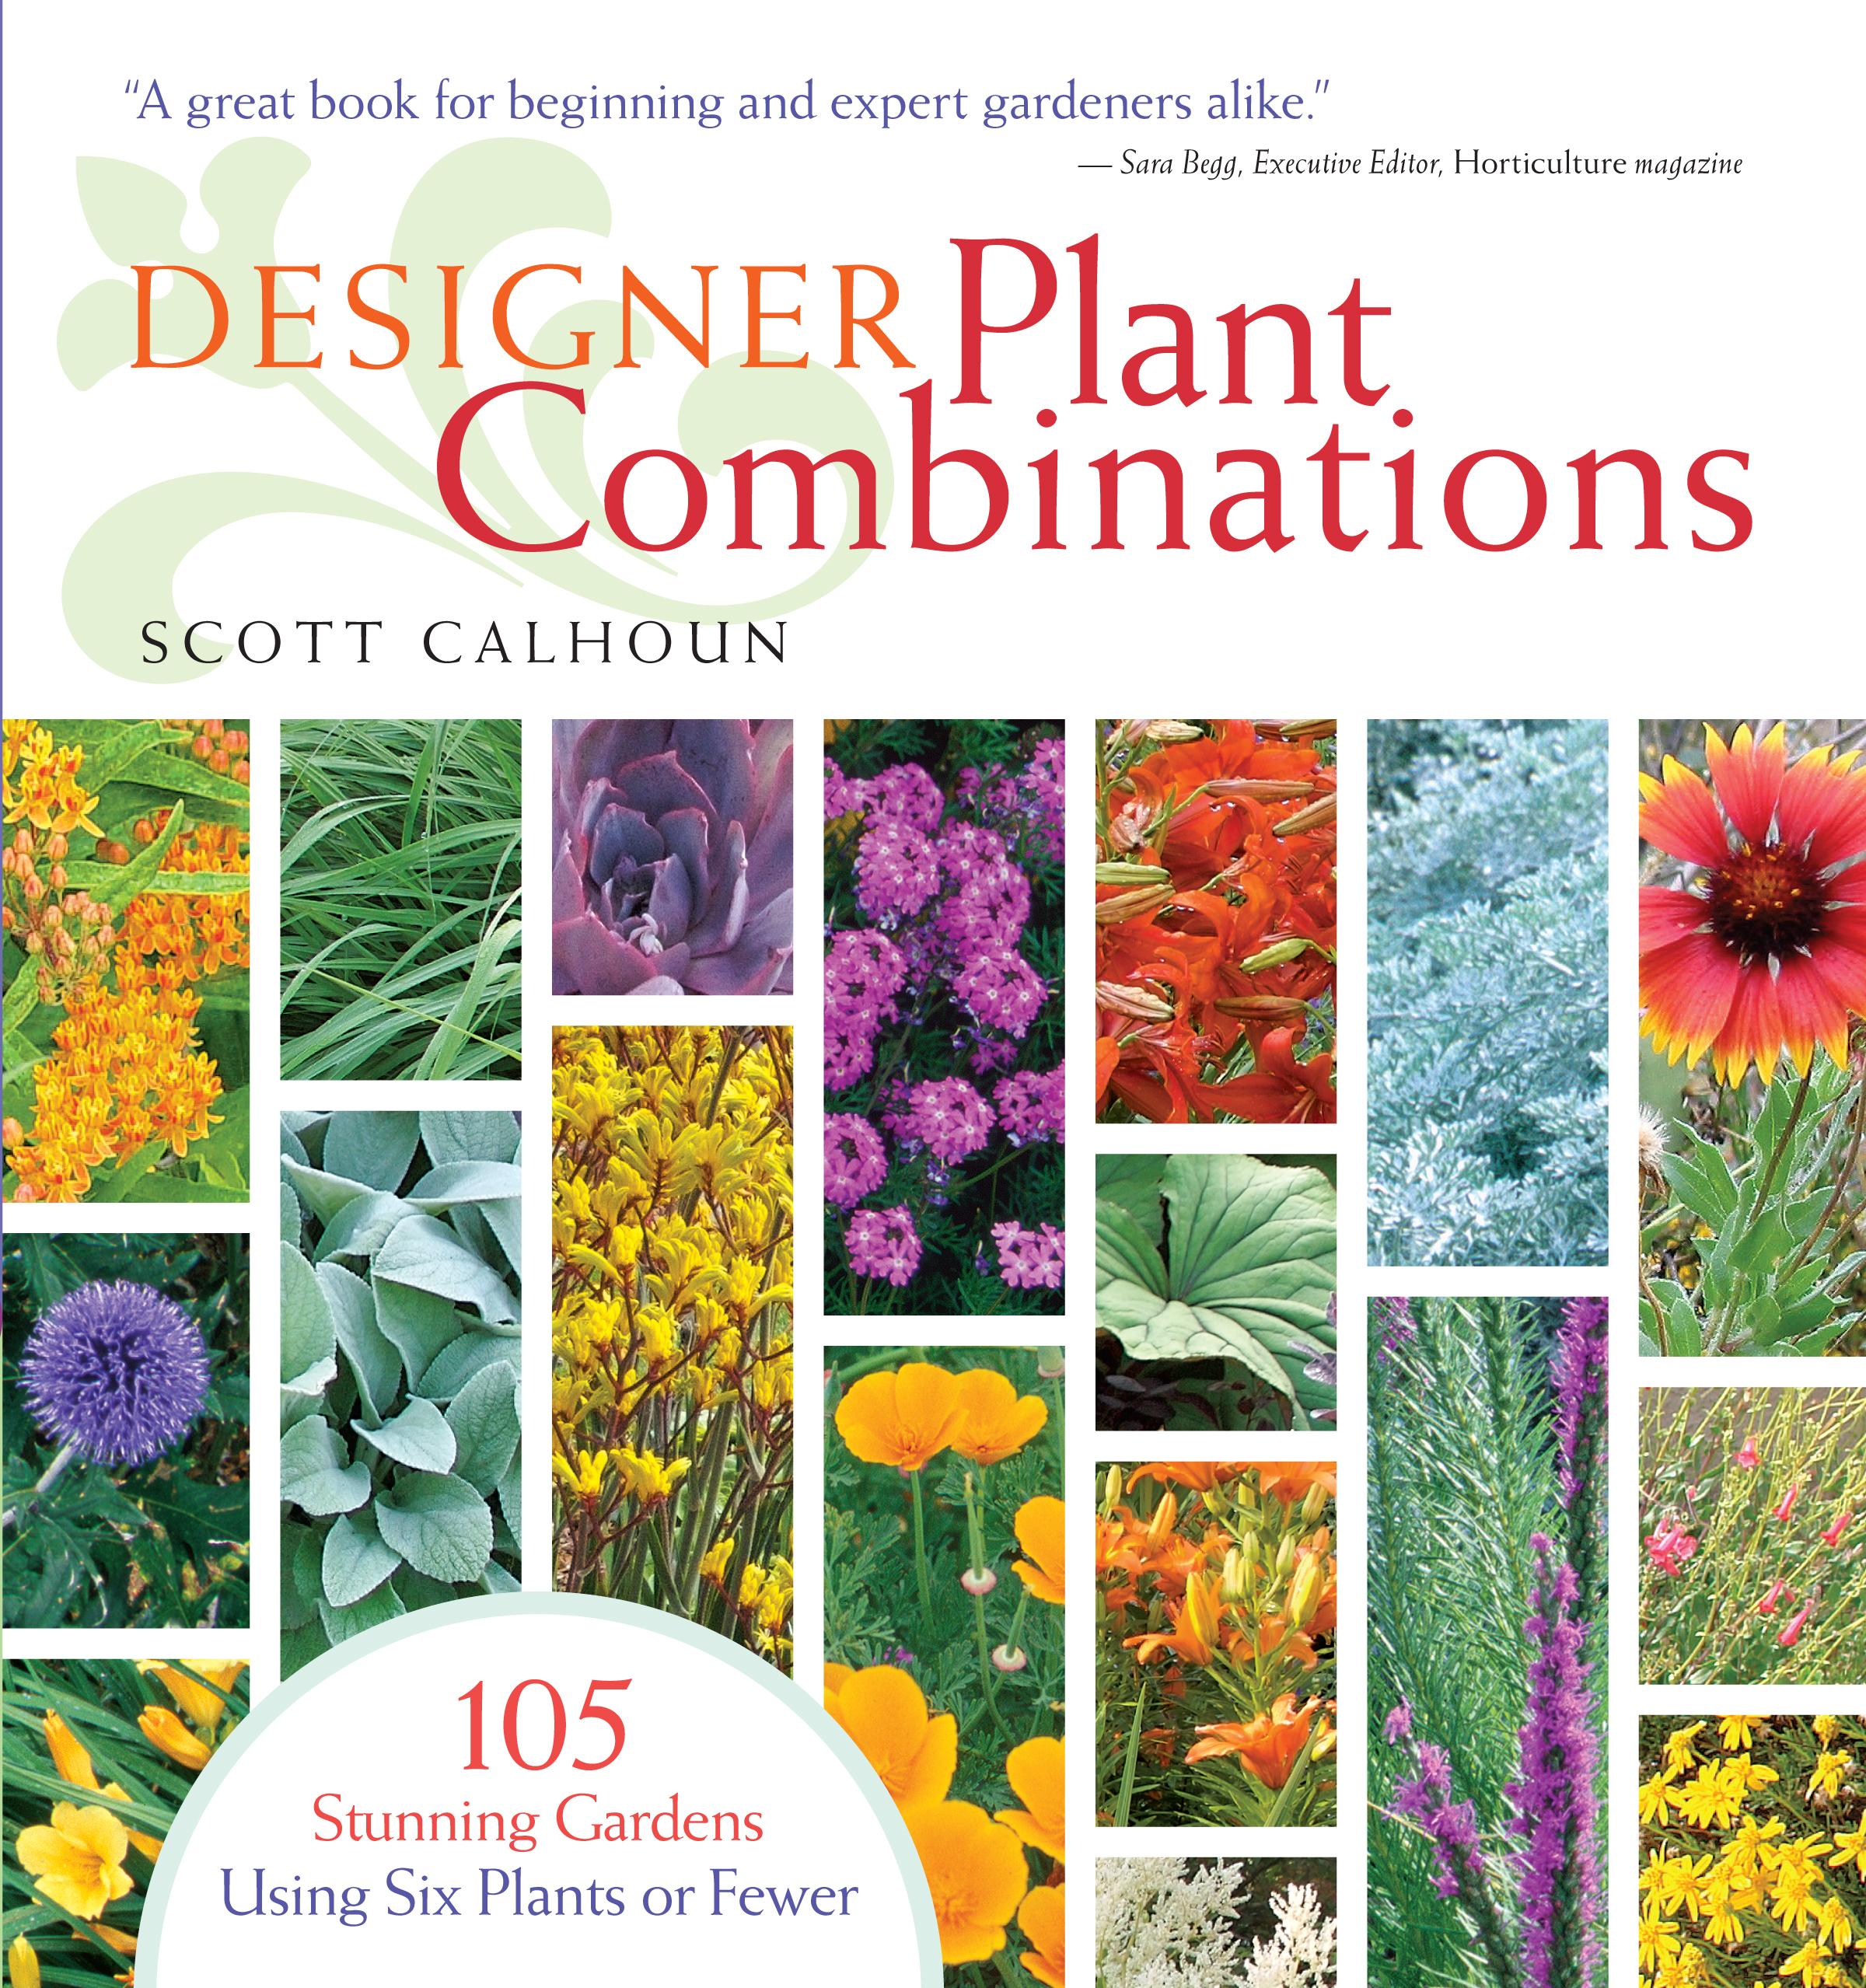 Designer Plant Combinations 105 Stunning Gardens Using Six Plants or Fewer - Scott Calhoun